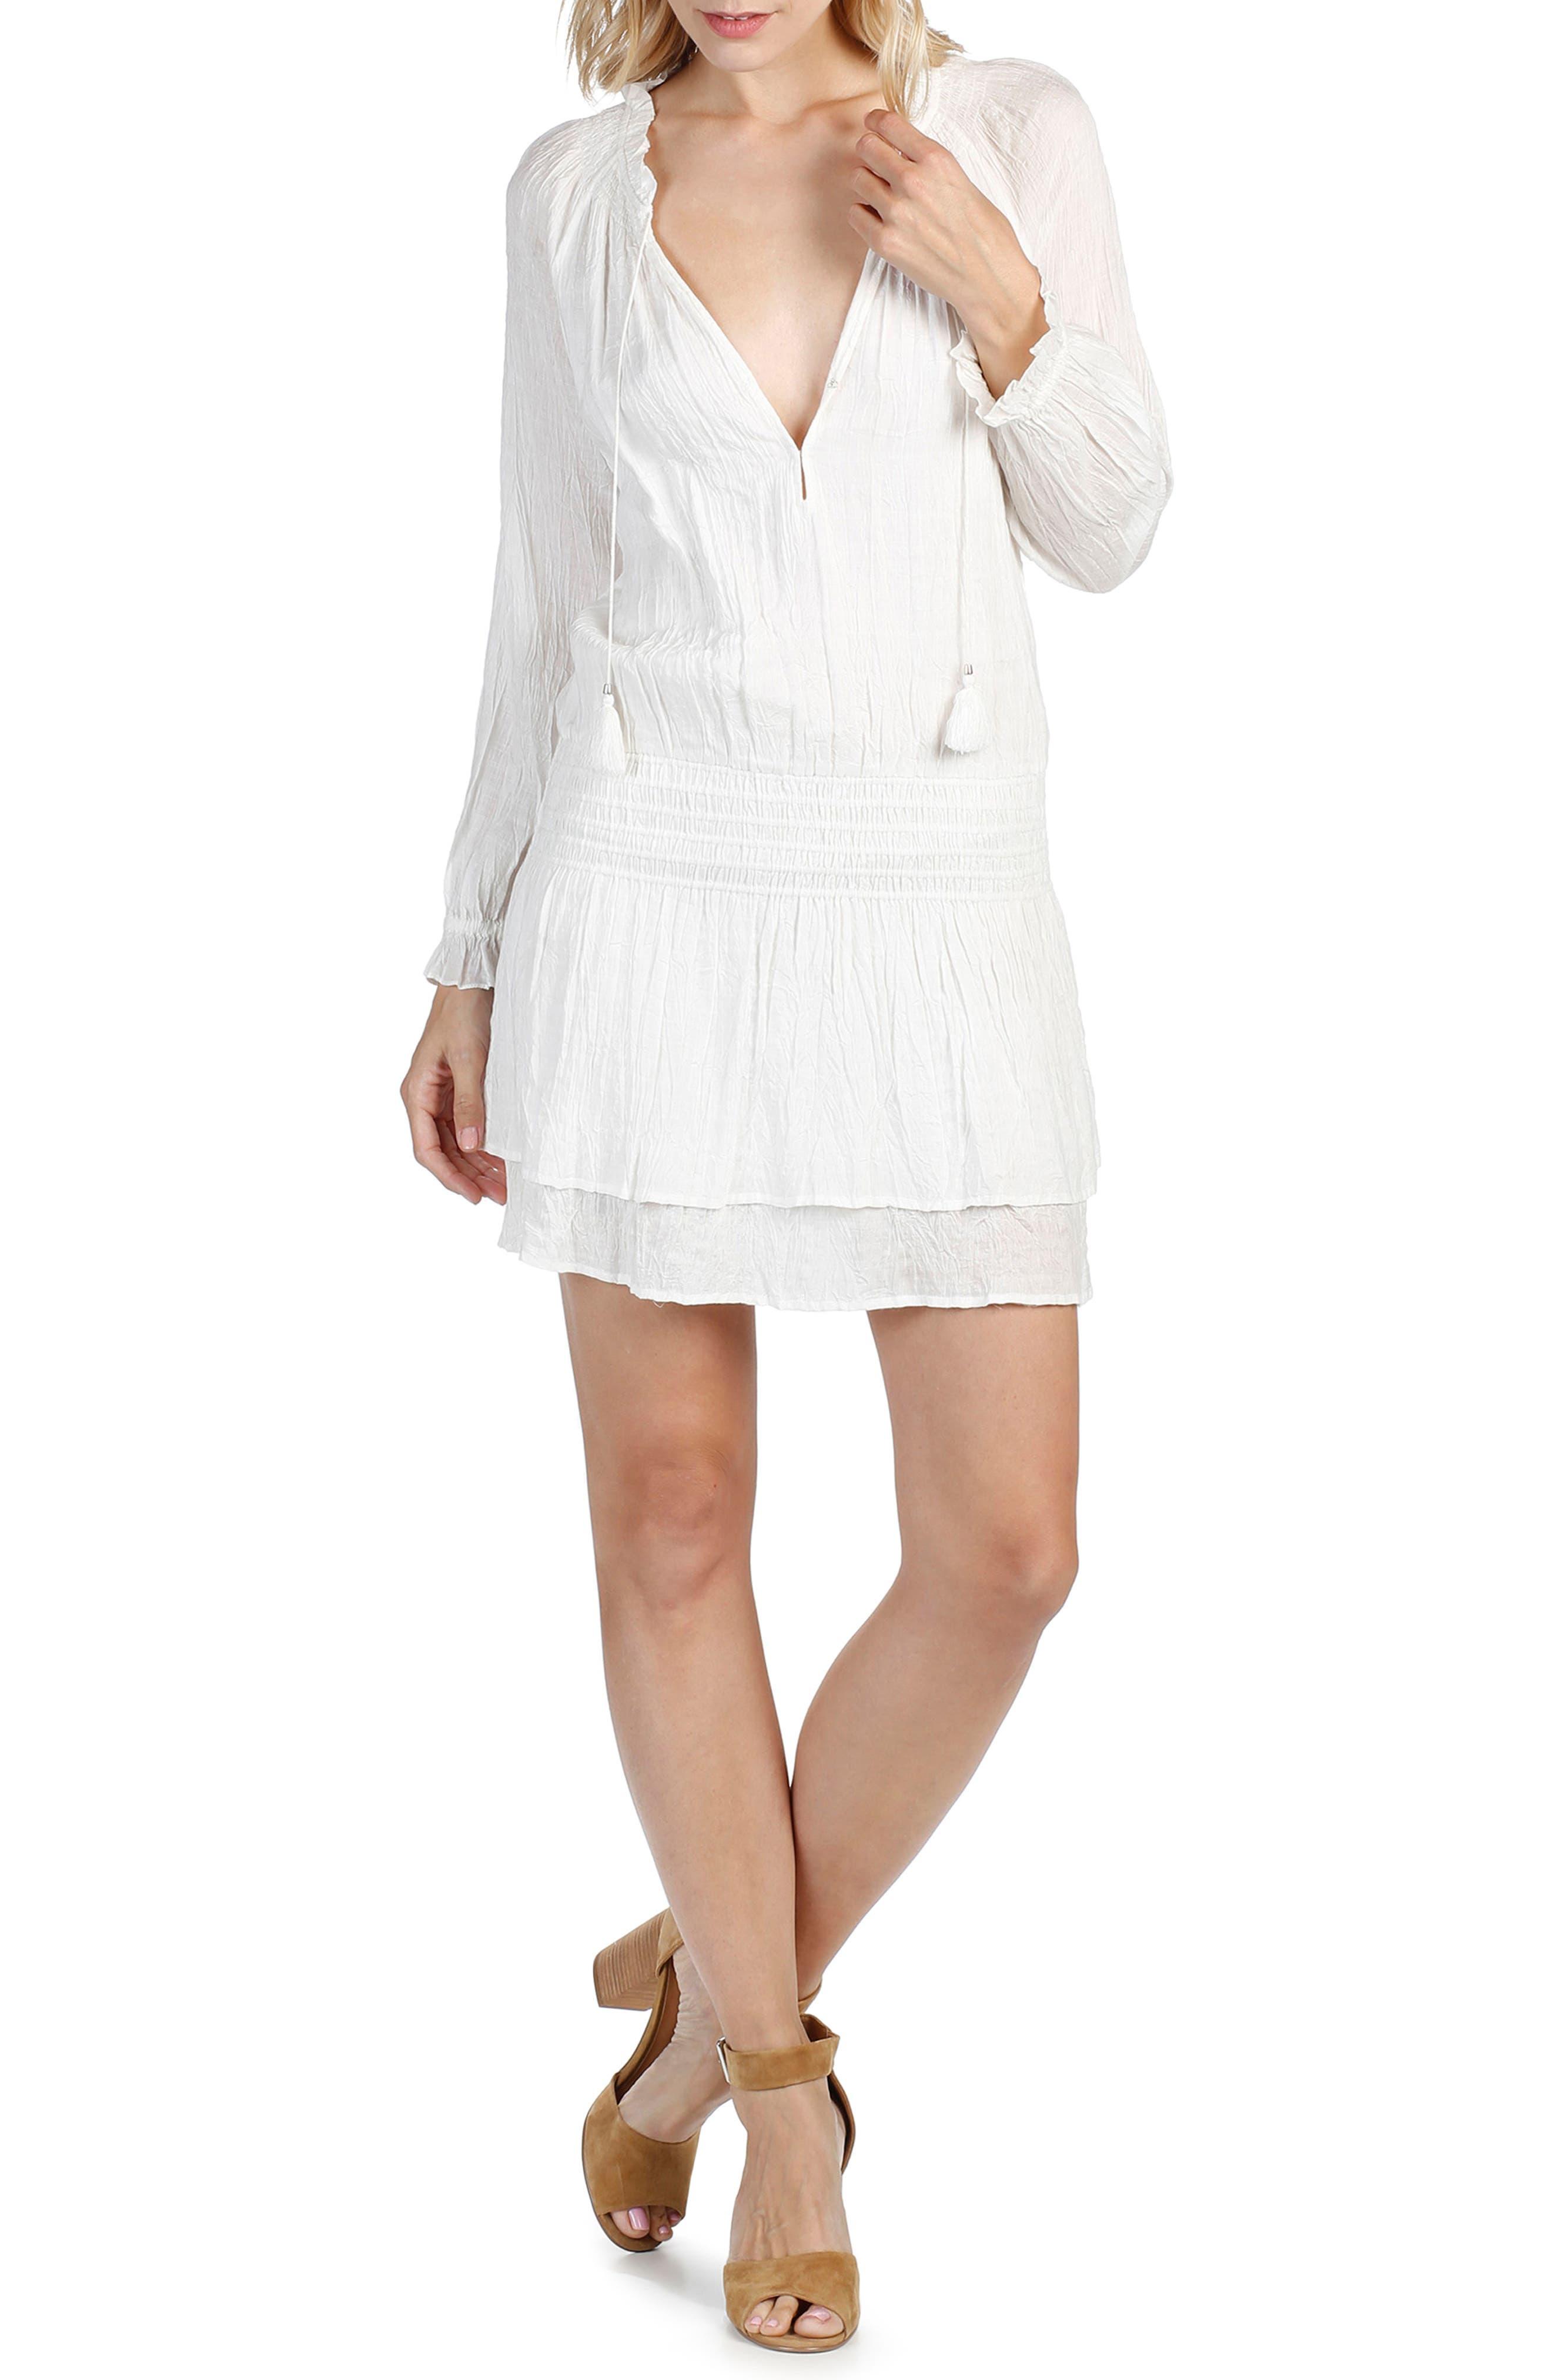 Lemay Dress,                         Main,                         color,